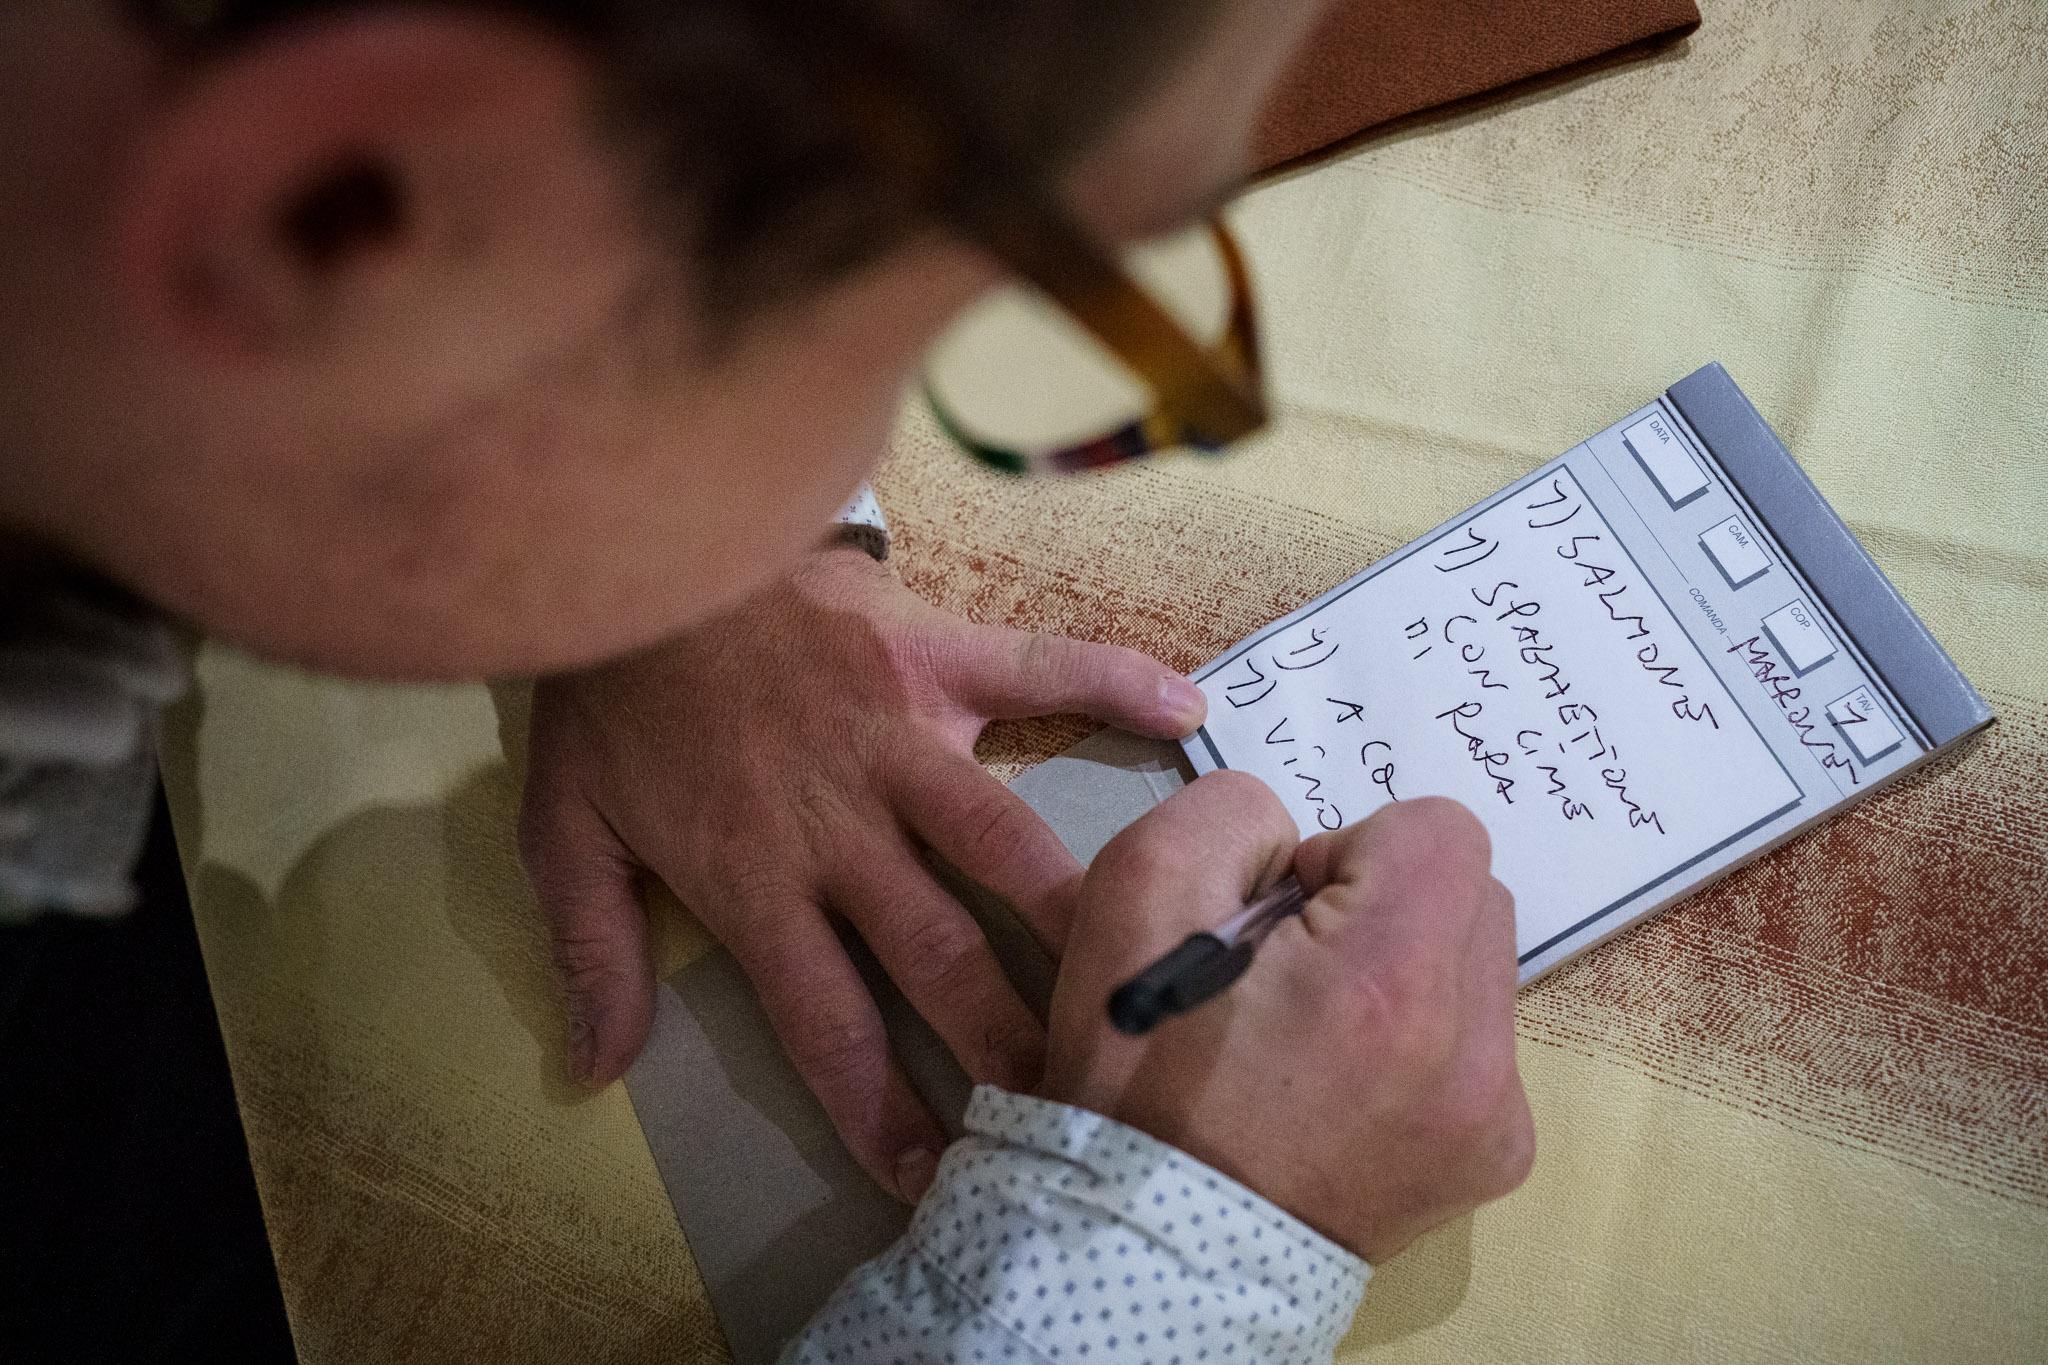 Jonathan writes an order